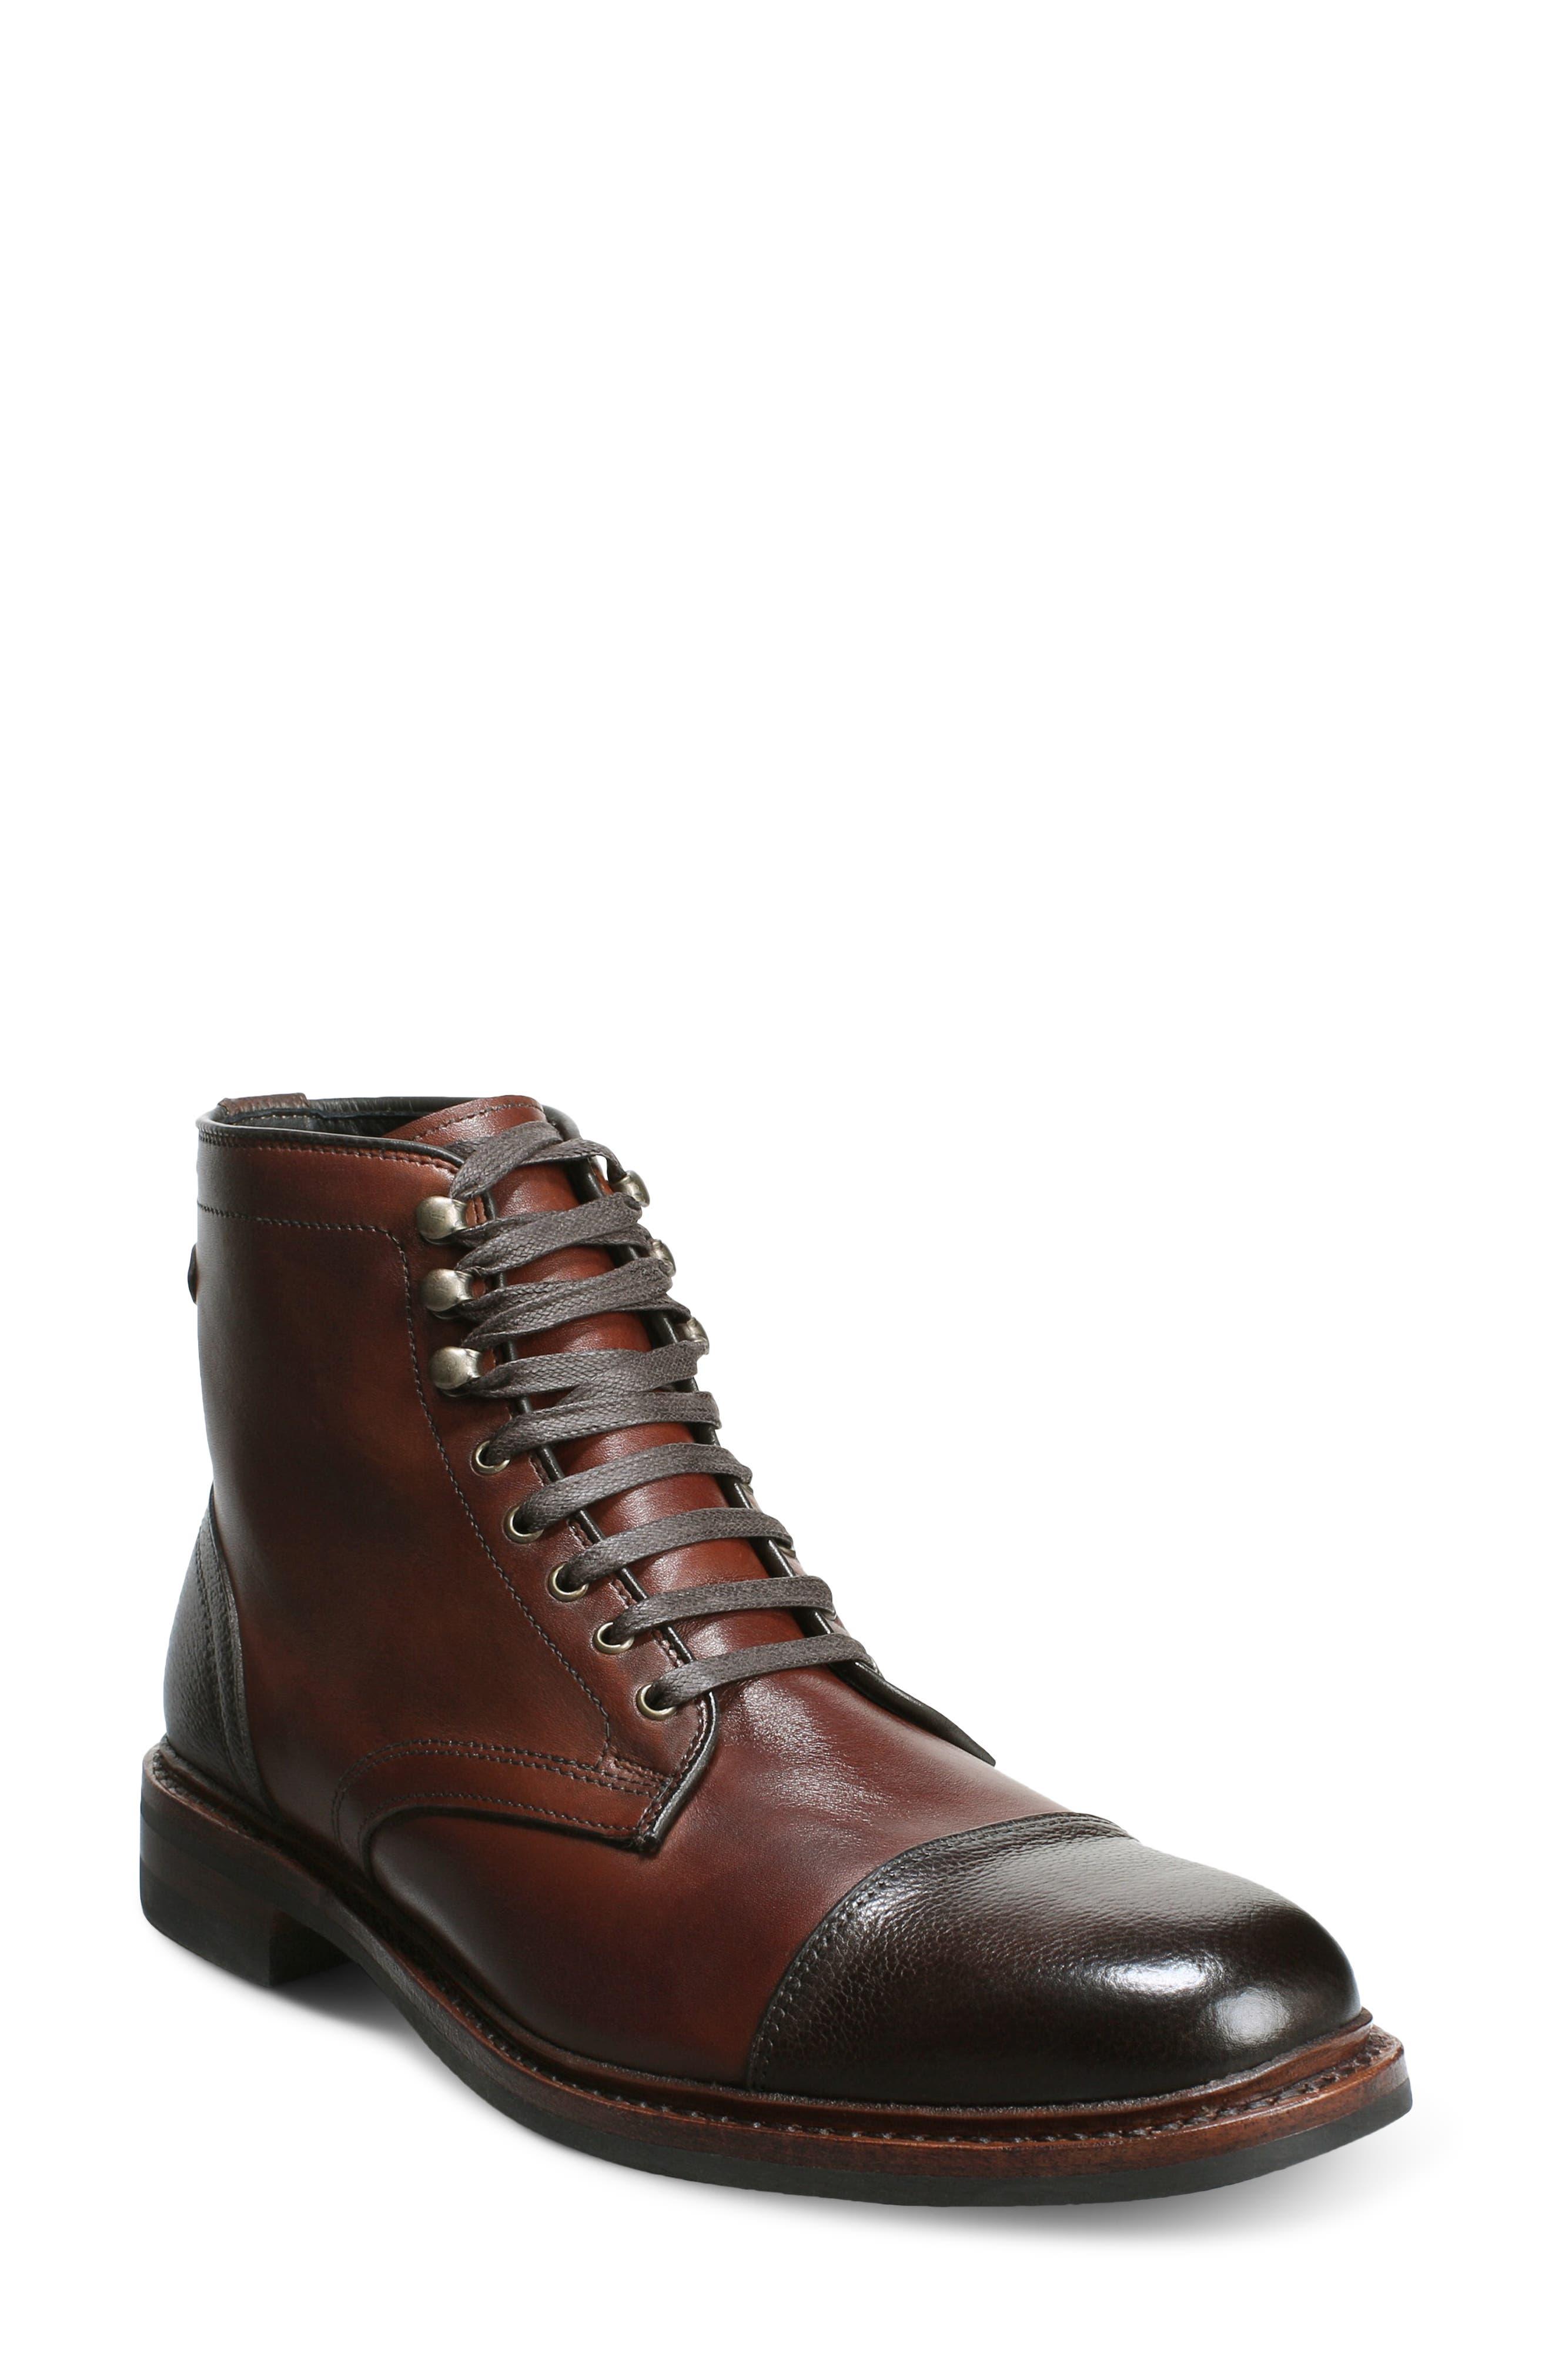 Landon Lace-Up Cap Toe Boot